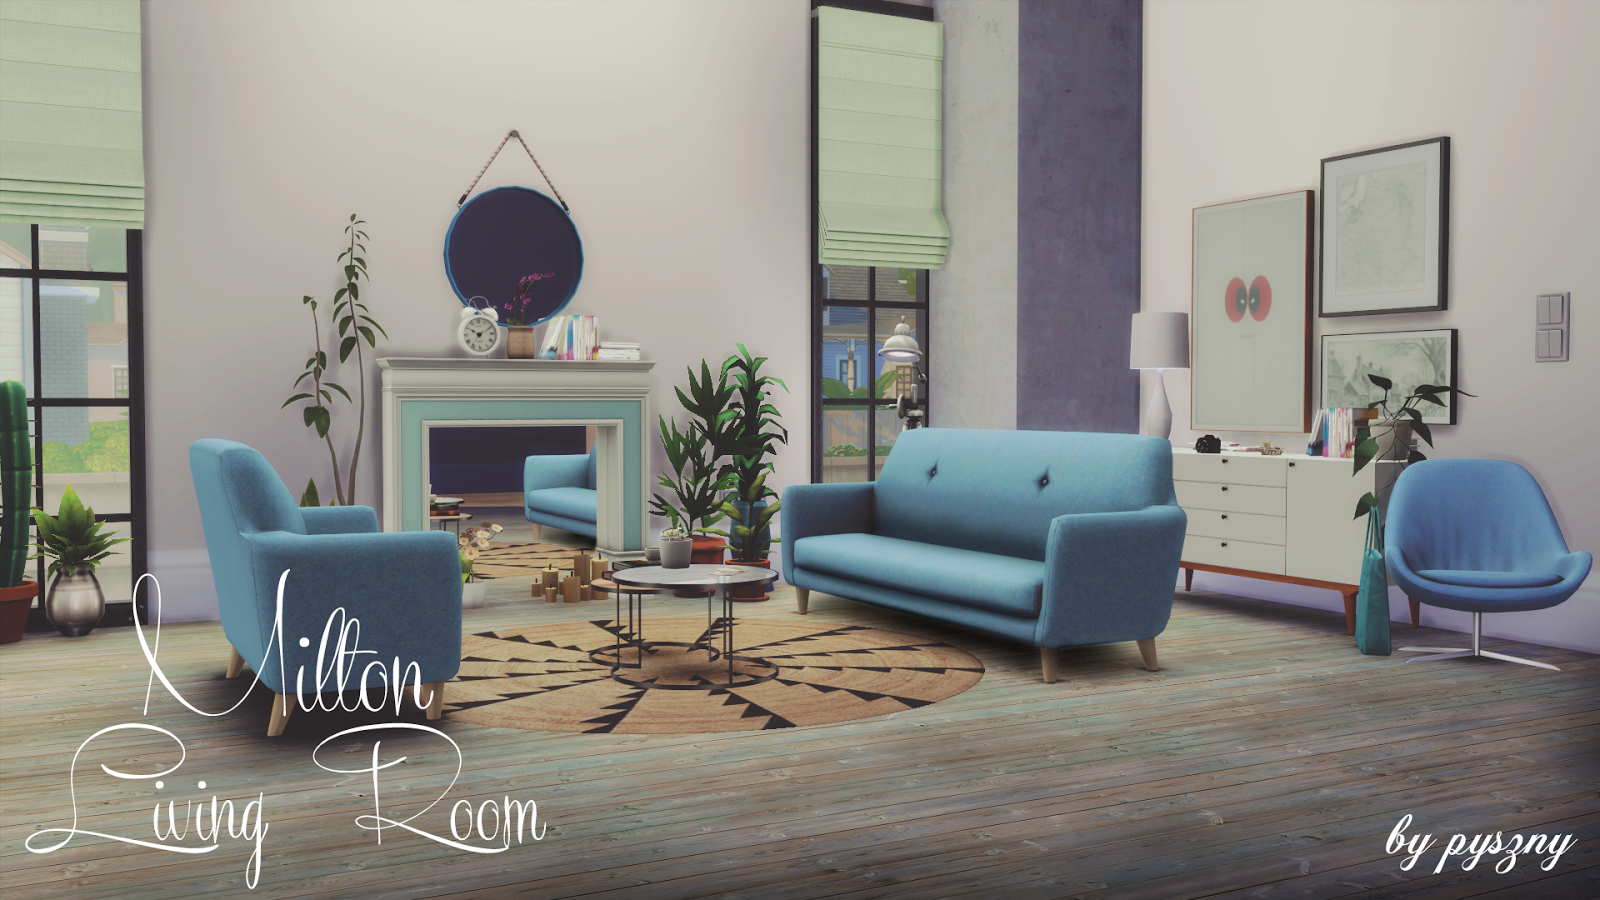 My Sims 4 Blog: Milton Living Room Set by Pyszny